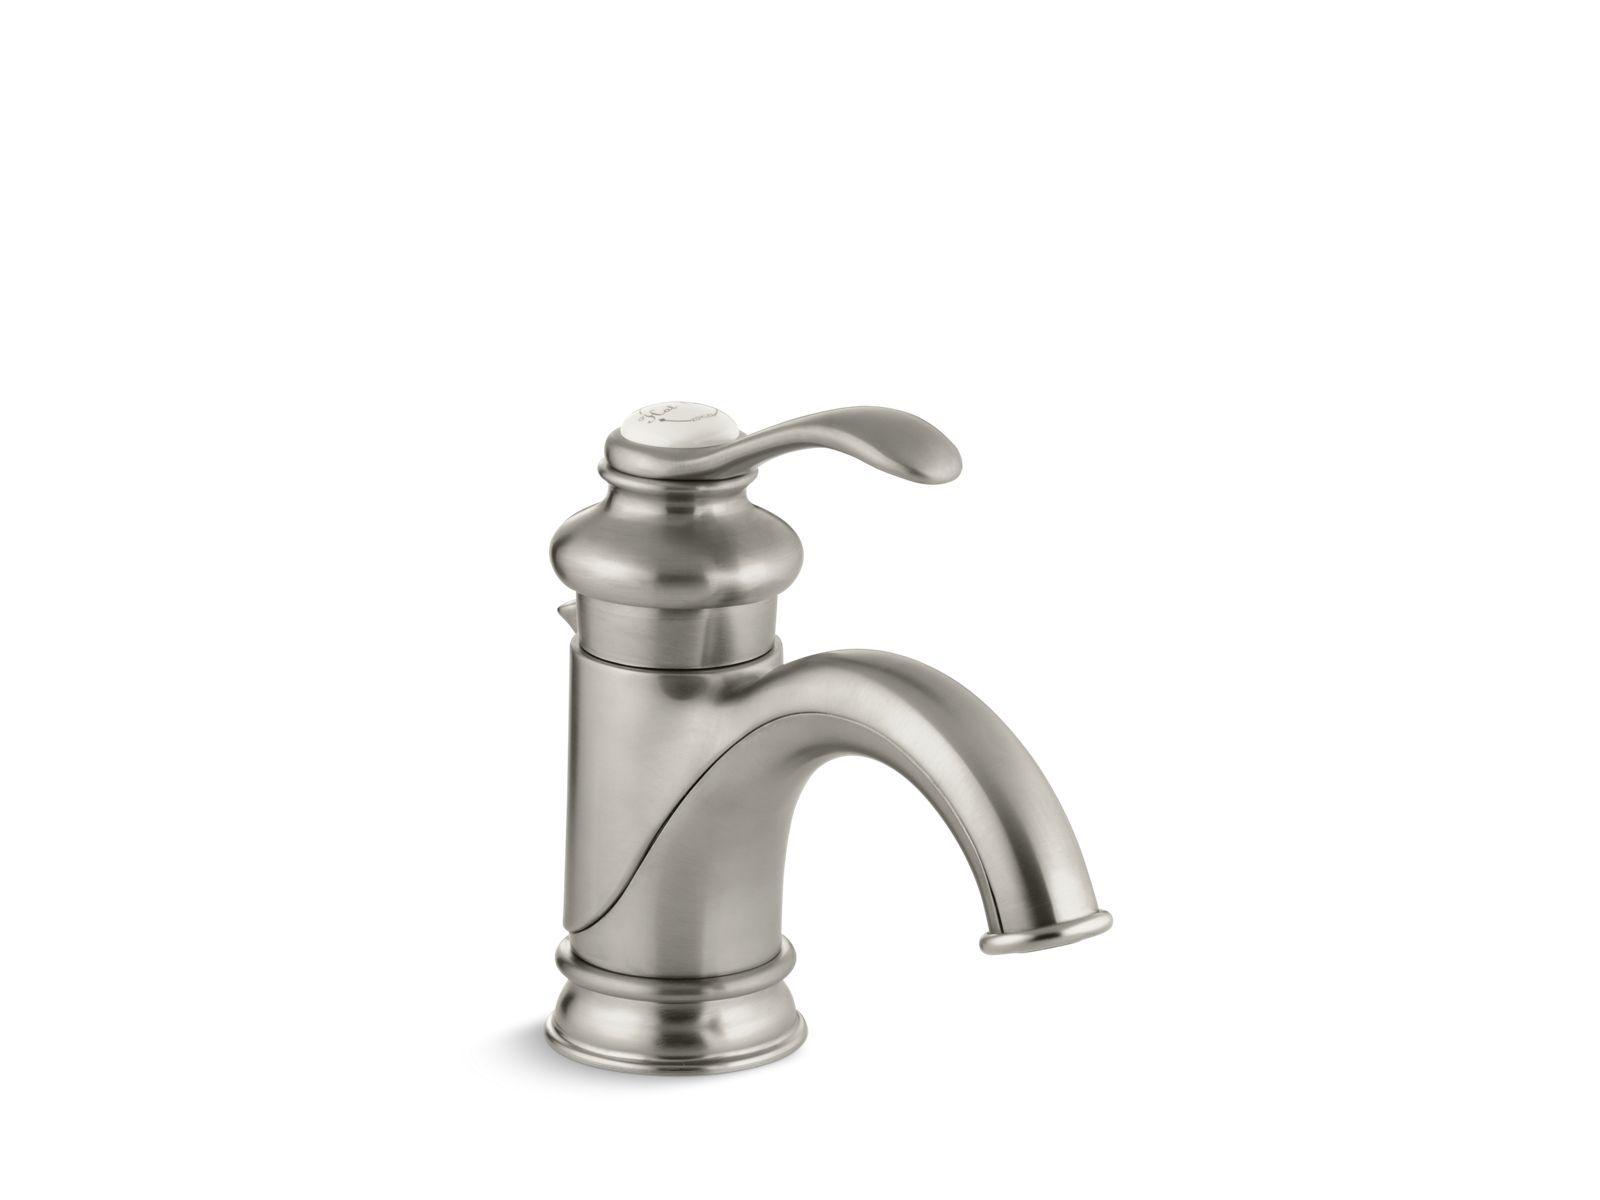 K-12182 | Fairfax Single-Control Bathroom Sink Faucet | KOHLER ...